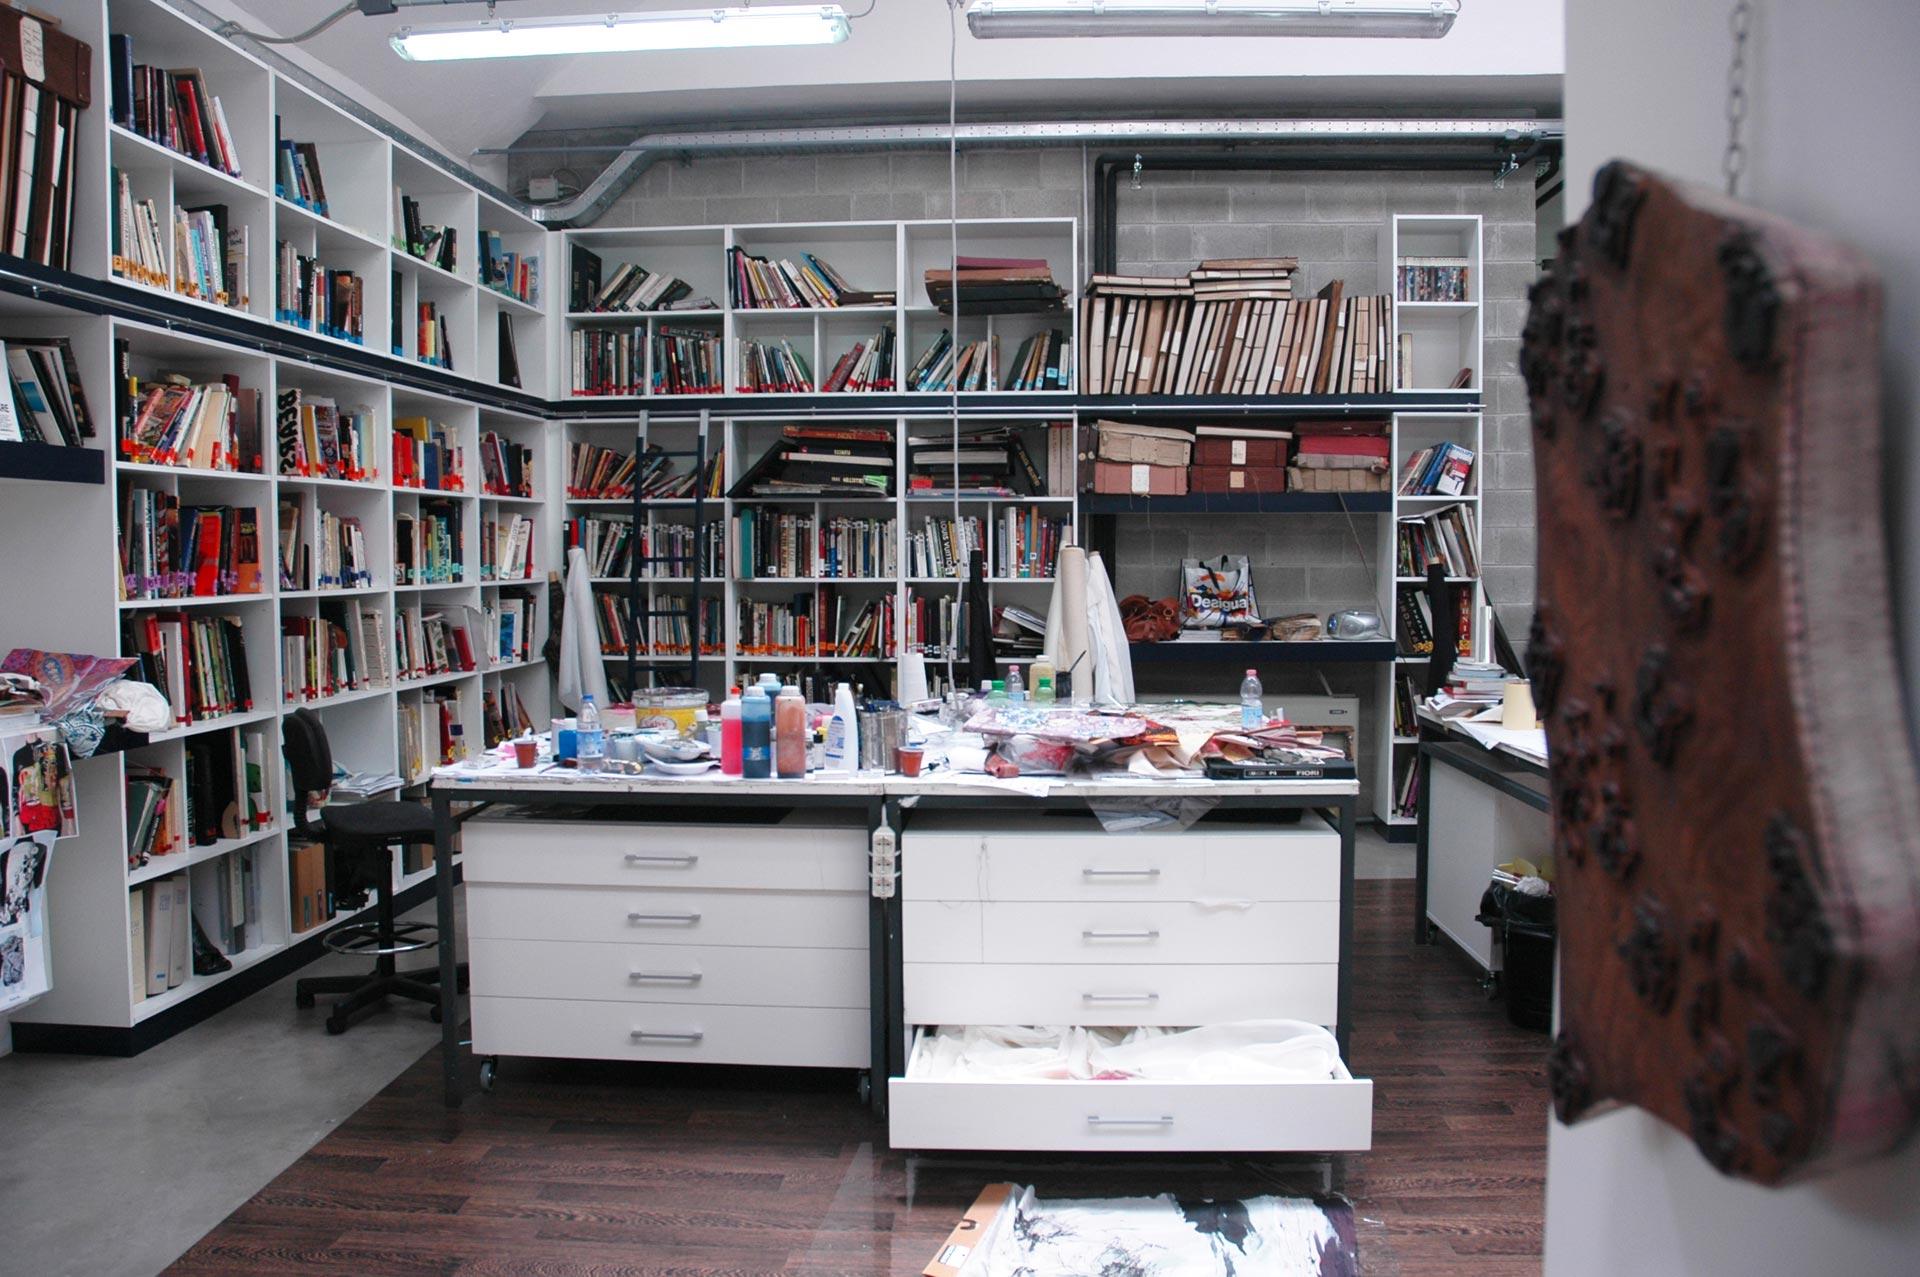 Anteprima Creative Studio